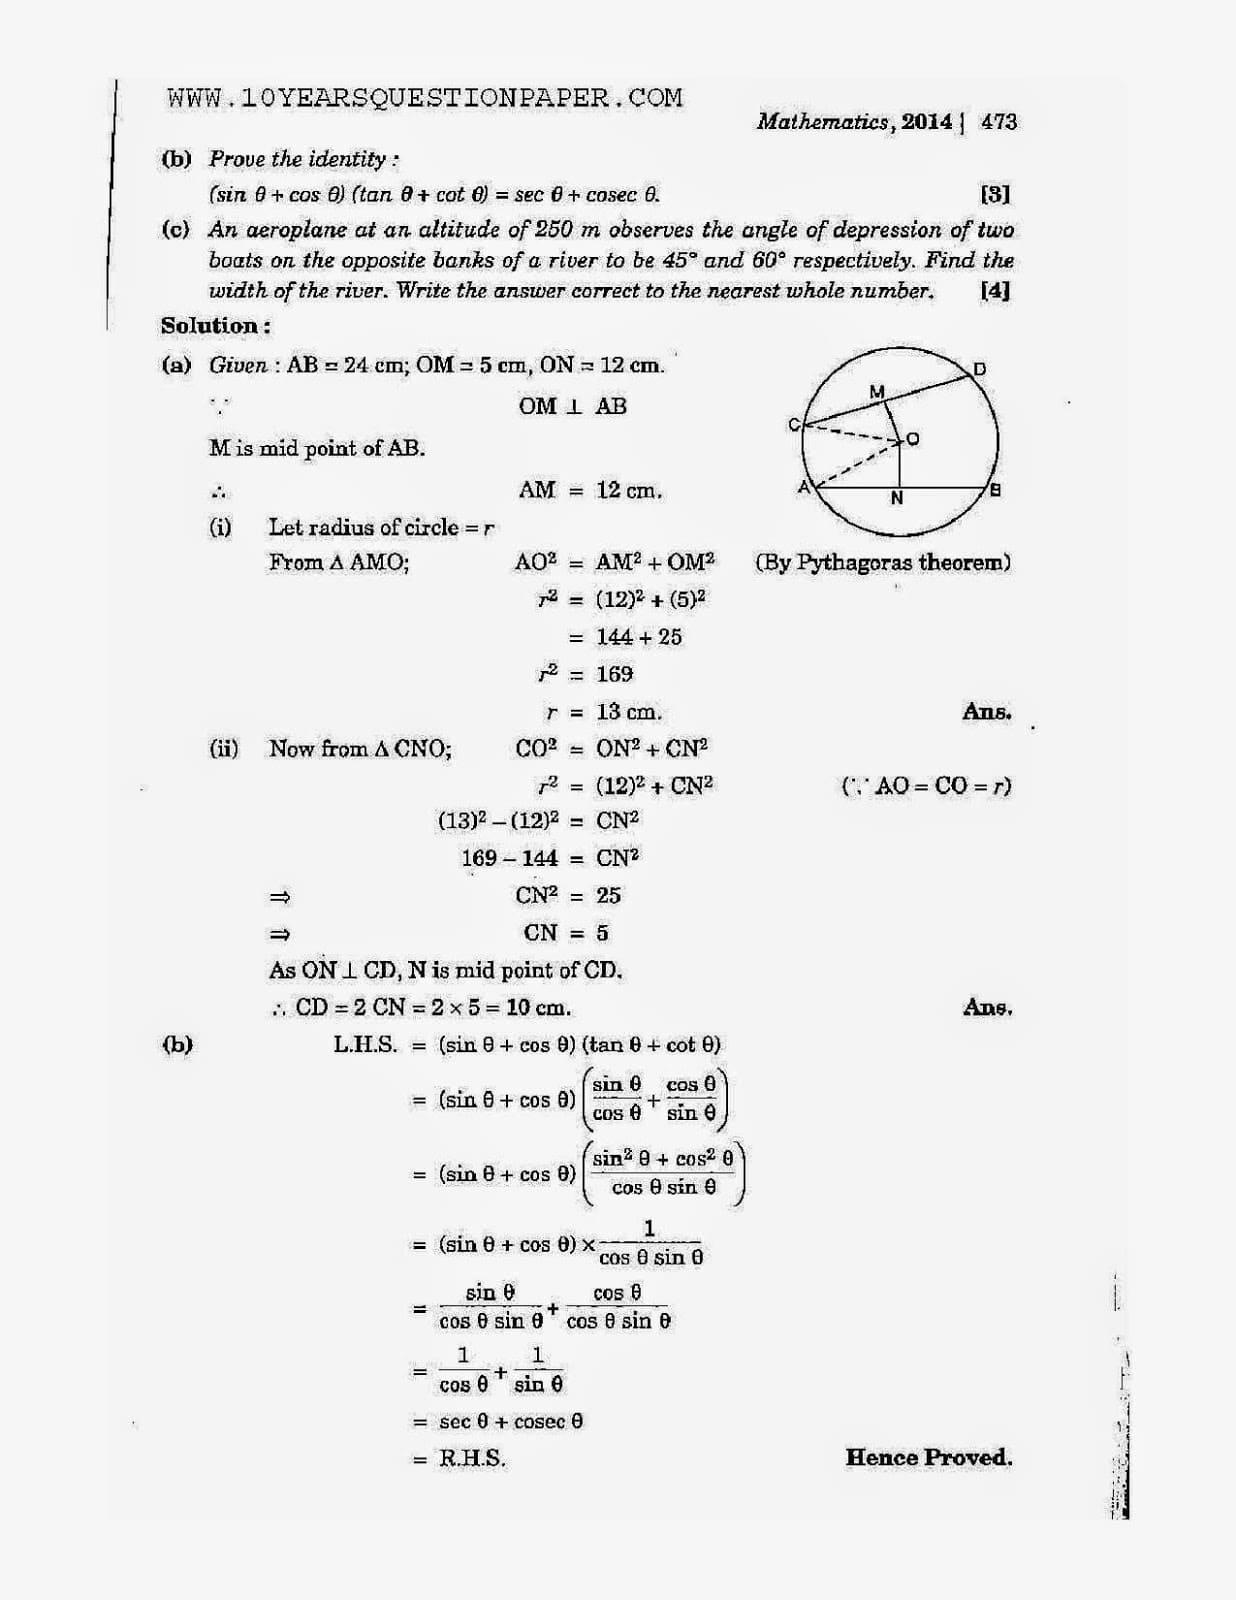 ICSE Class 10 Mathematics 2014 Question Paper